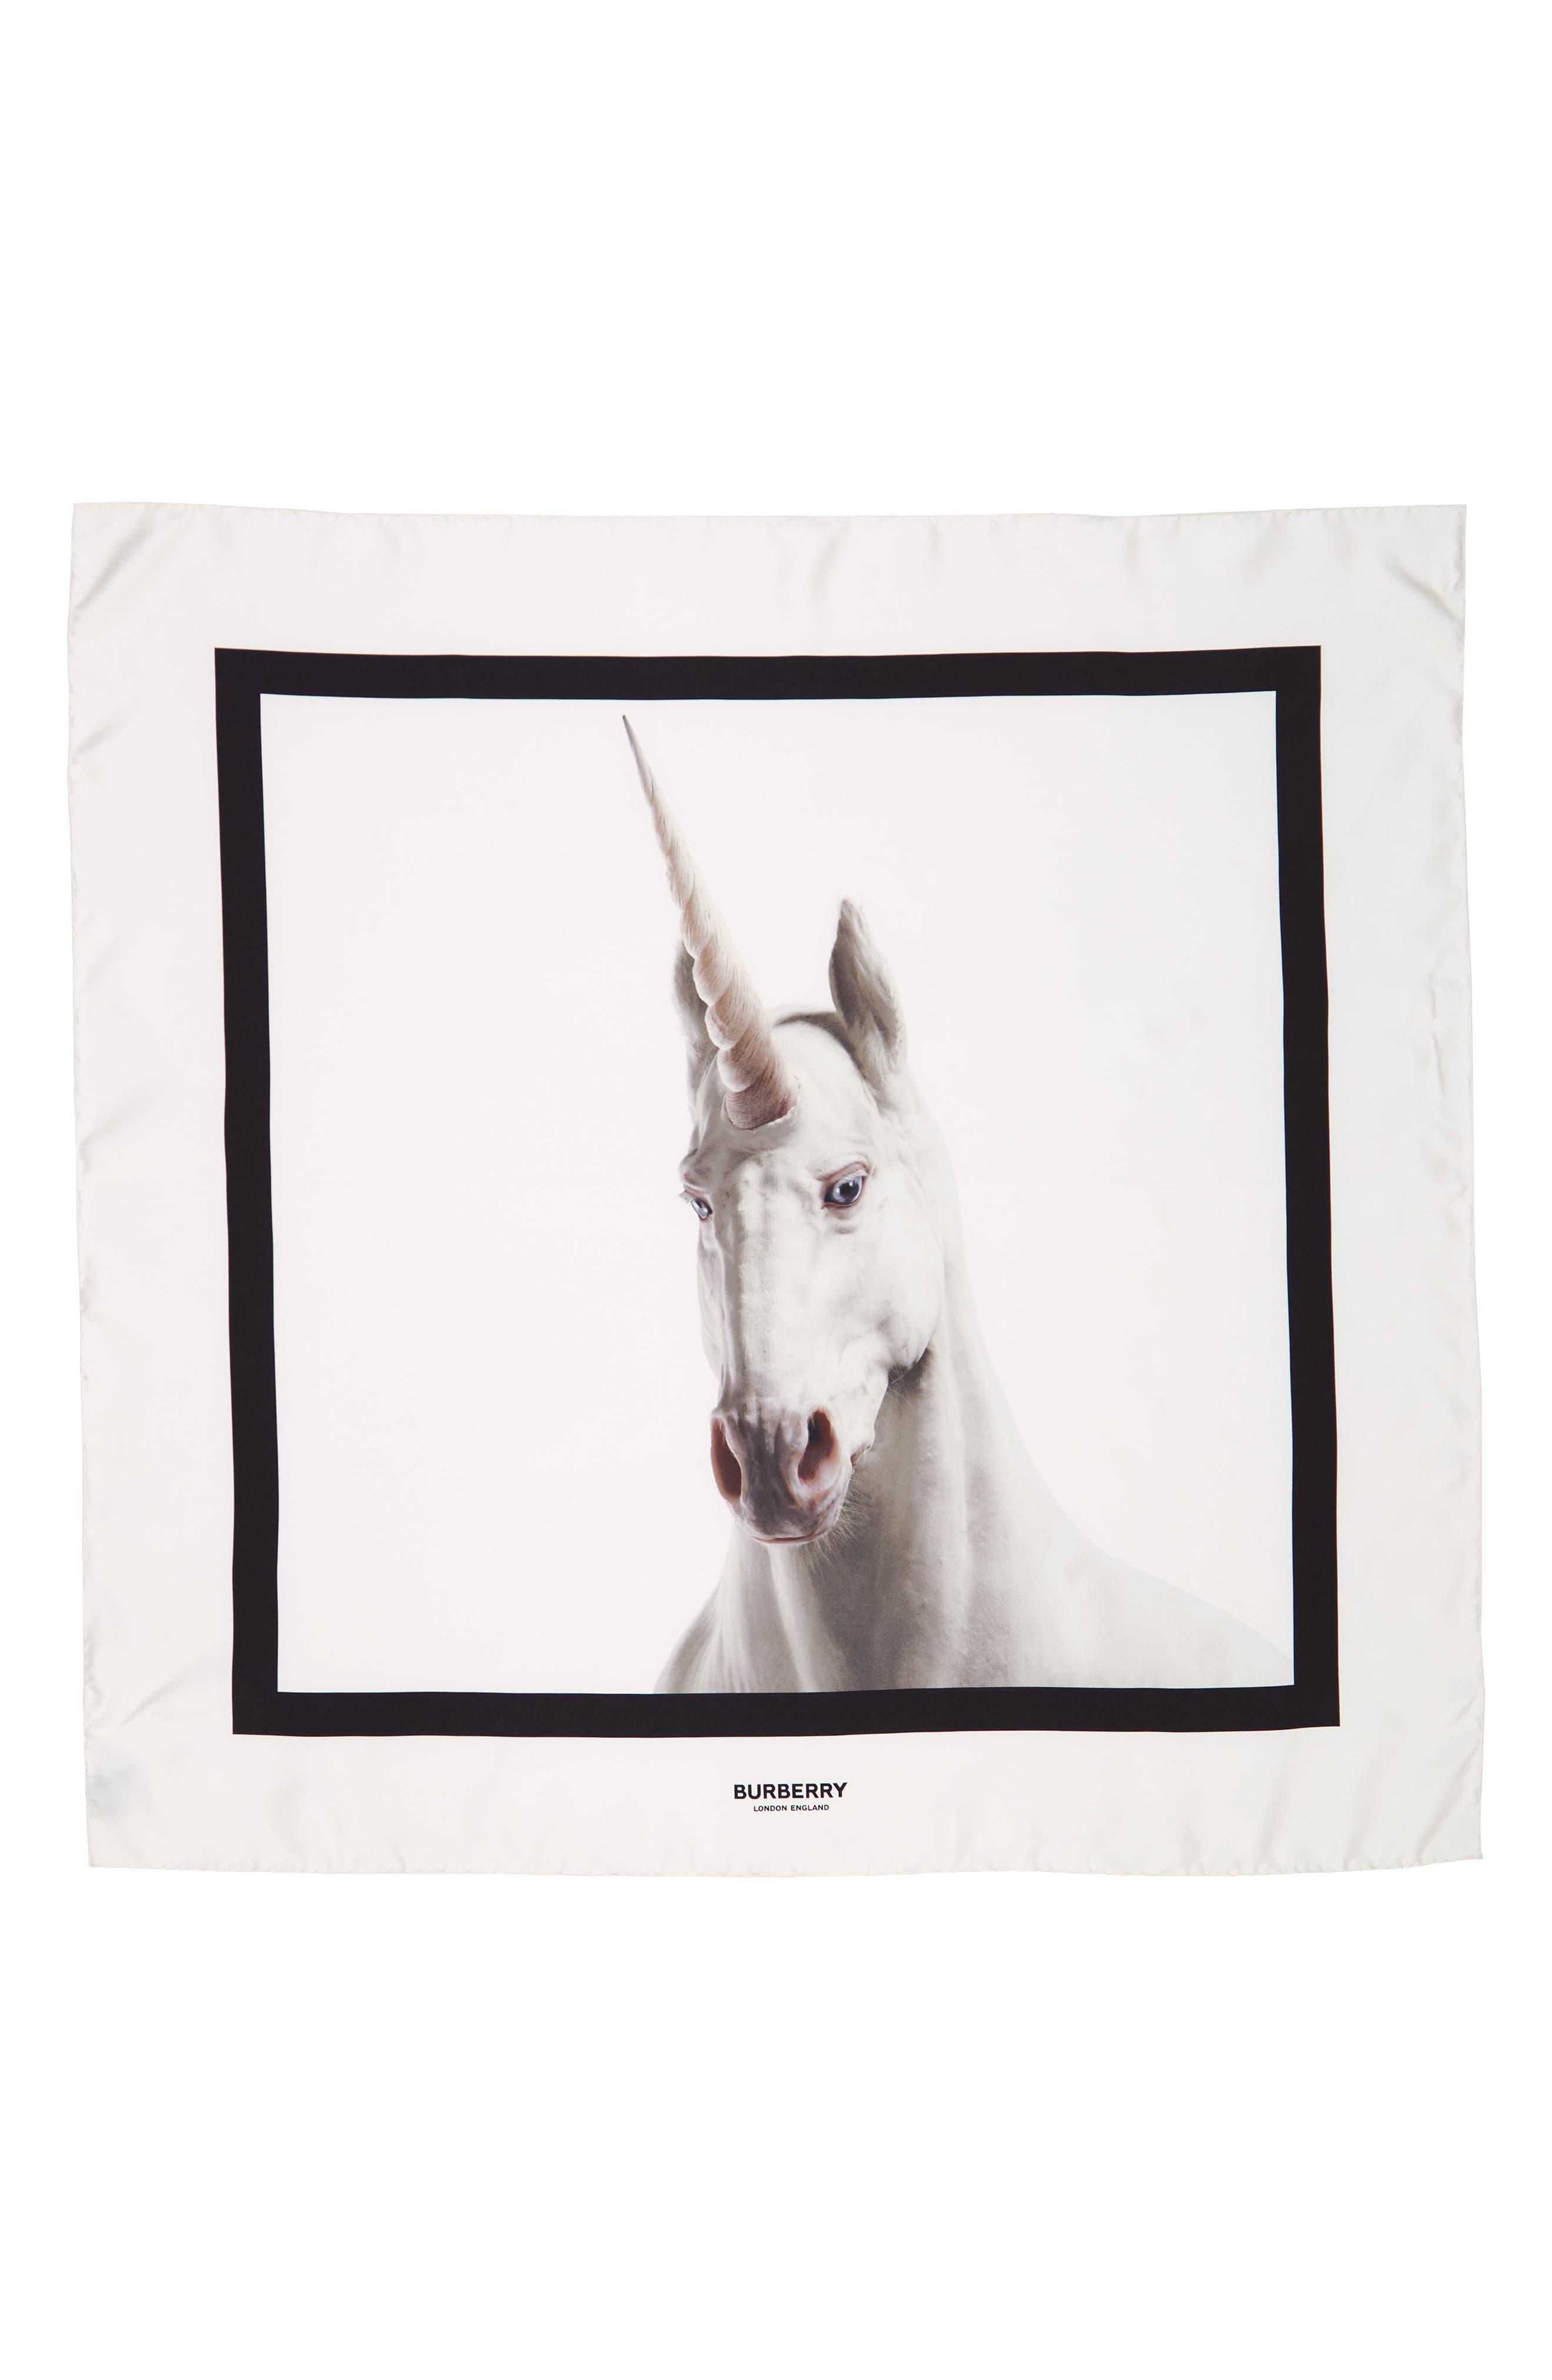 BURBERRY, Unicorn Graphic Square Silk Scarf, Main thumbnail 1, color, WHITE